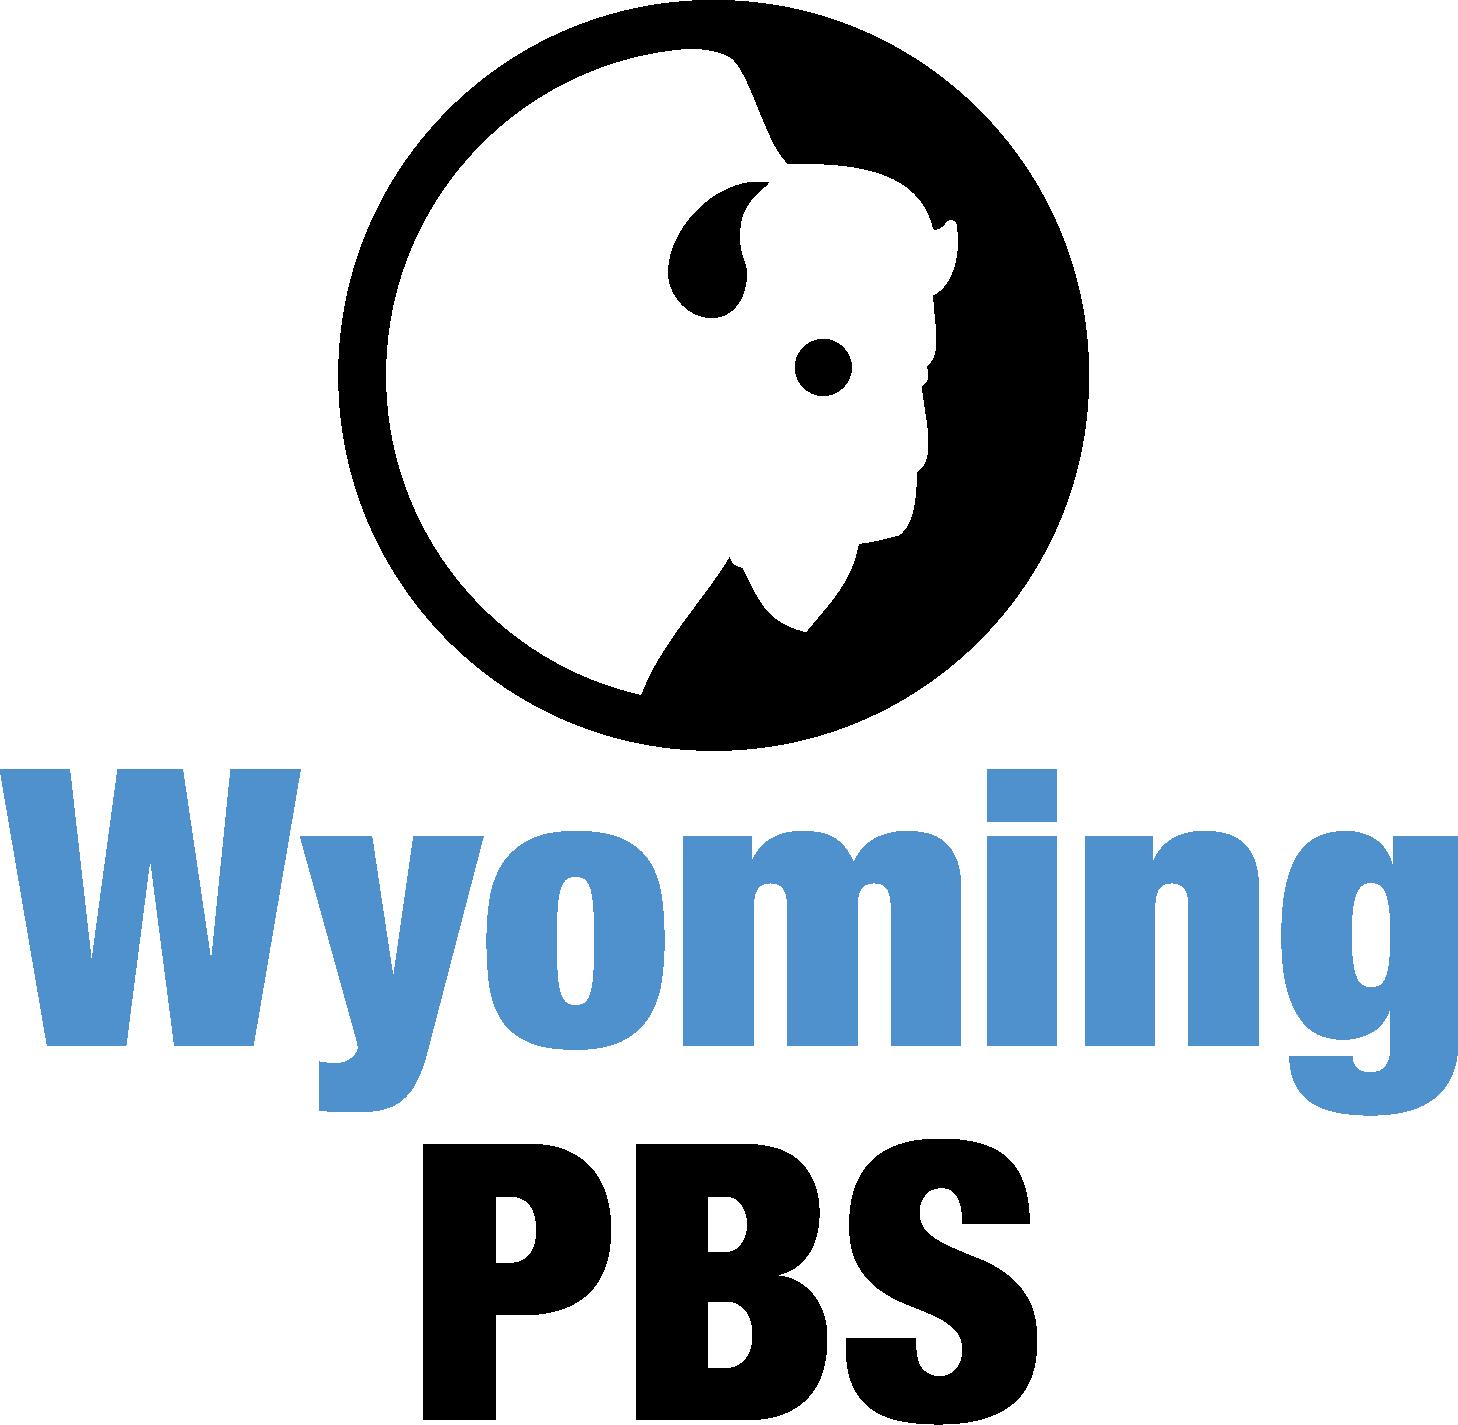 WyomingPBS